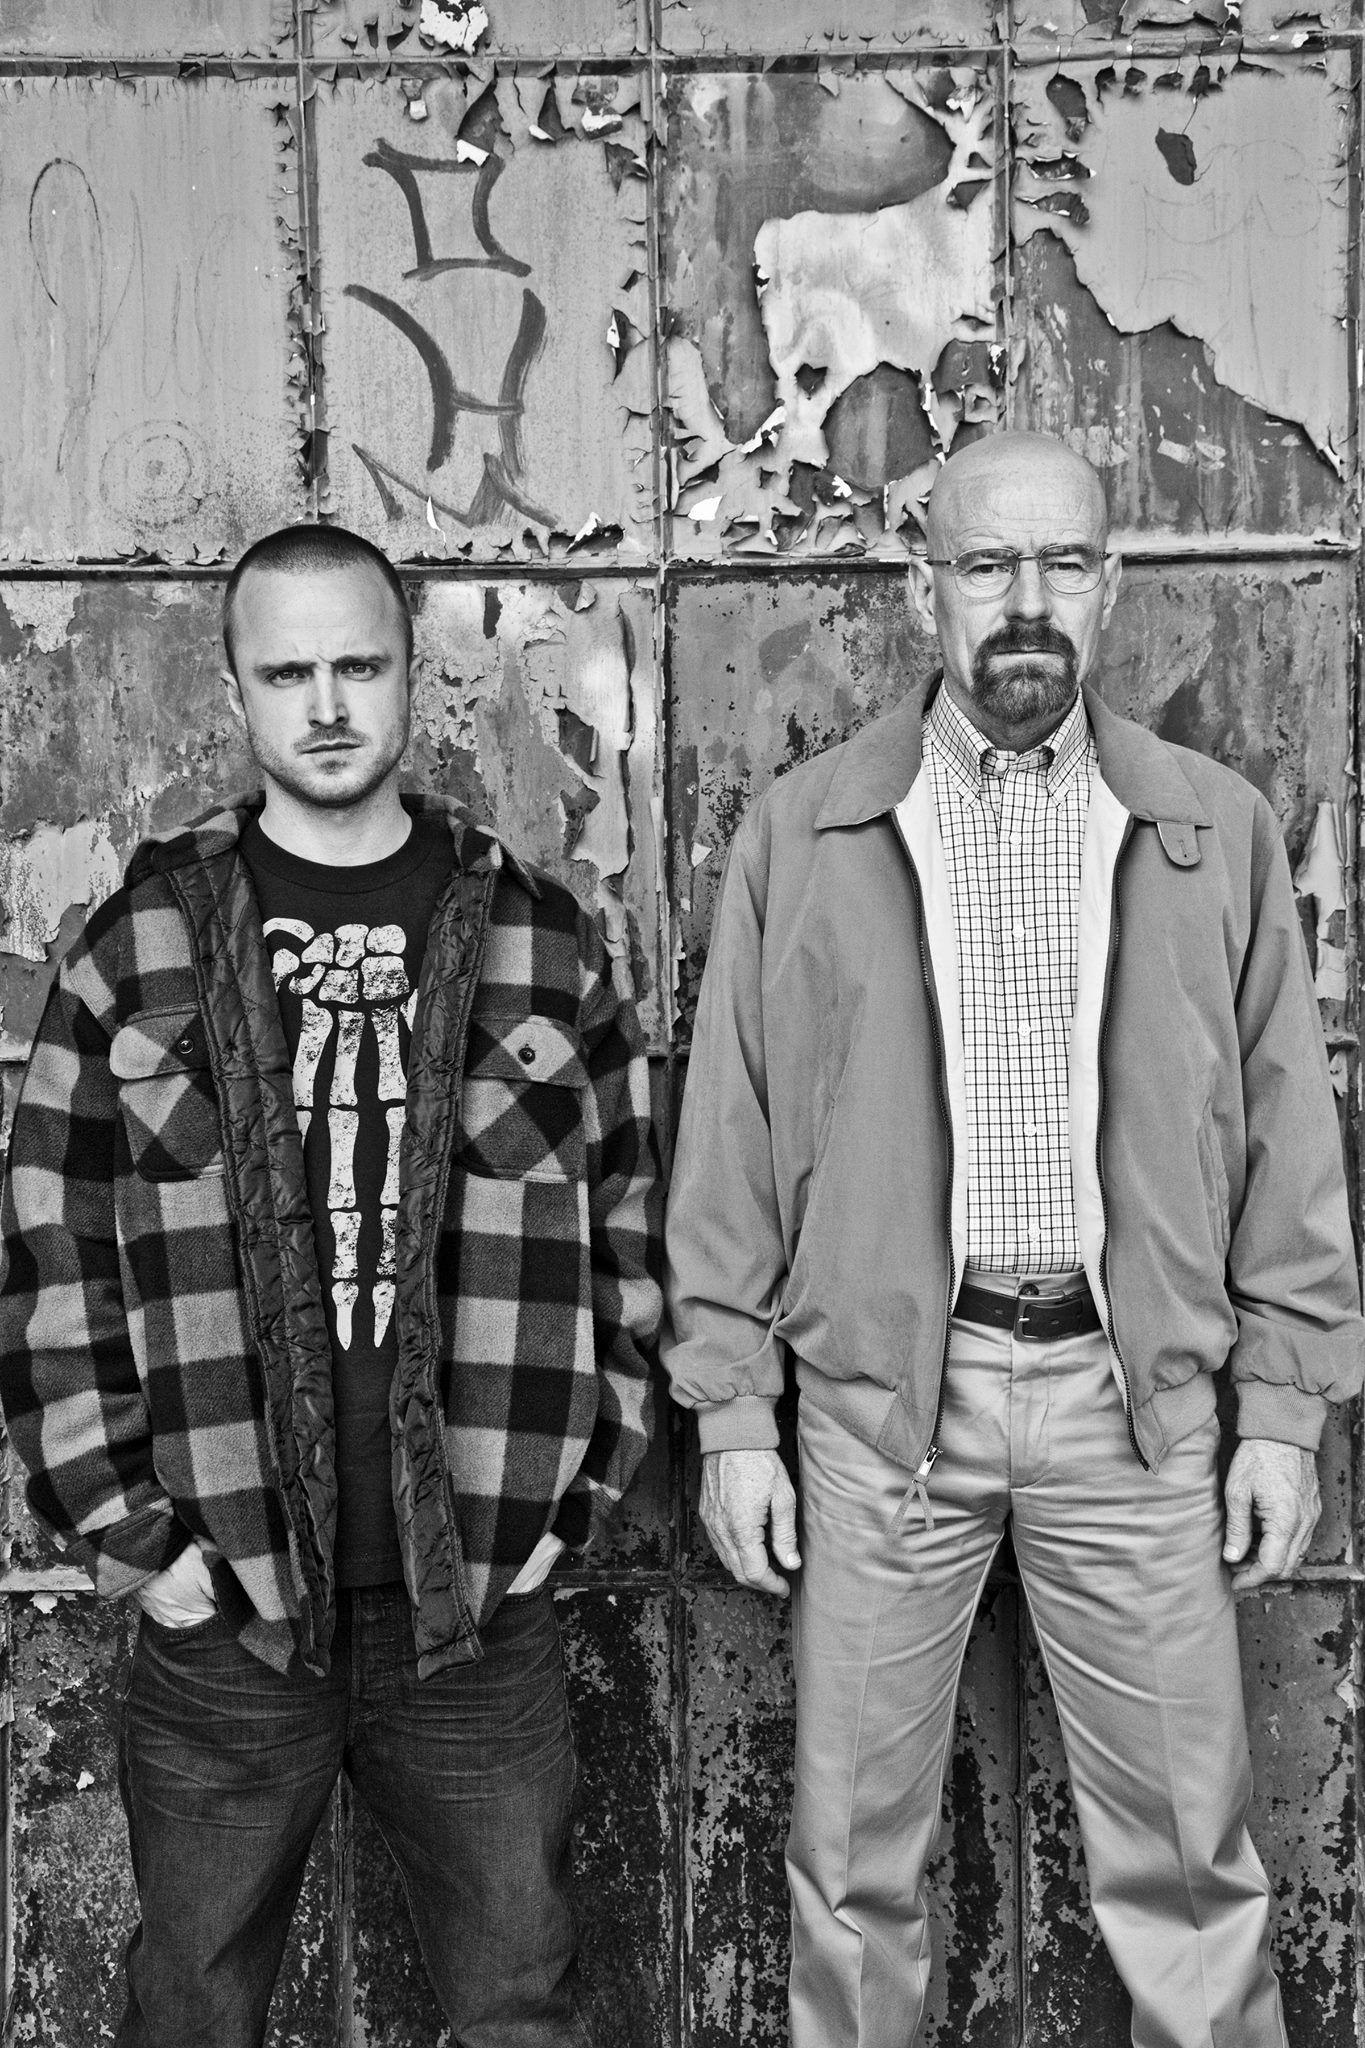 Breaking Bad - Free Screenings Coming Soon @ the North Door sponsored by the BC Smoke Shop - Season Premiere August 11th